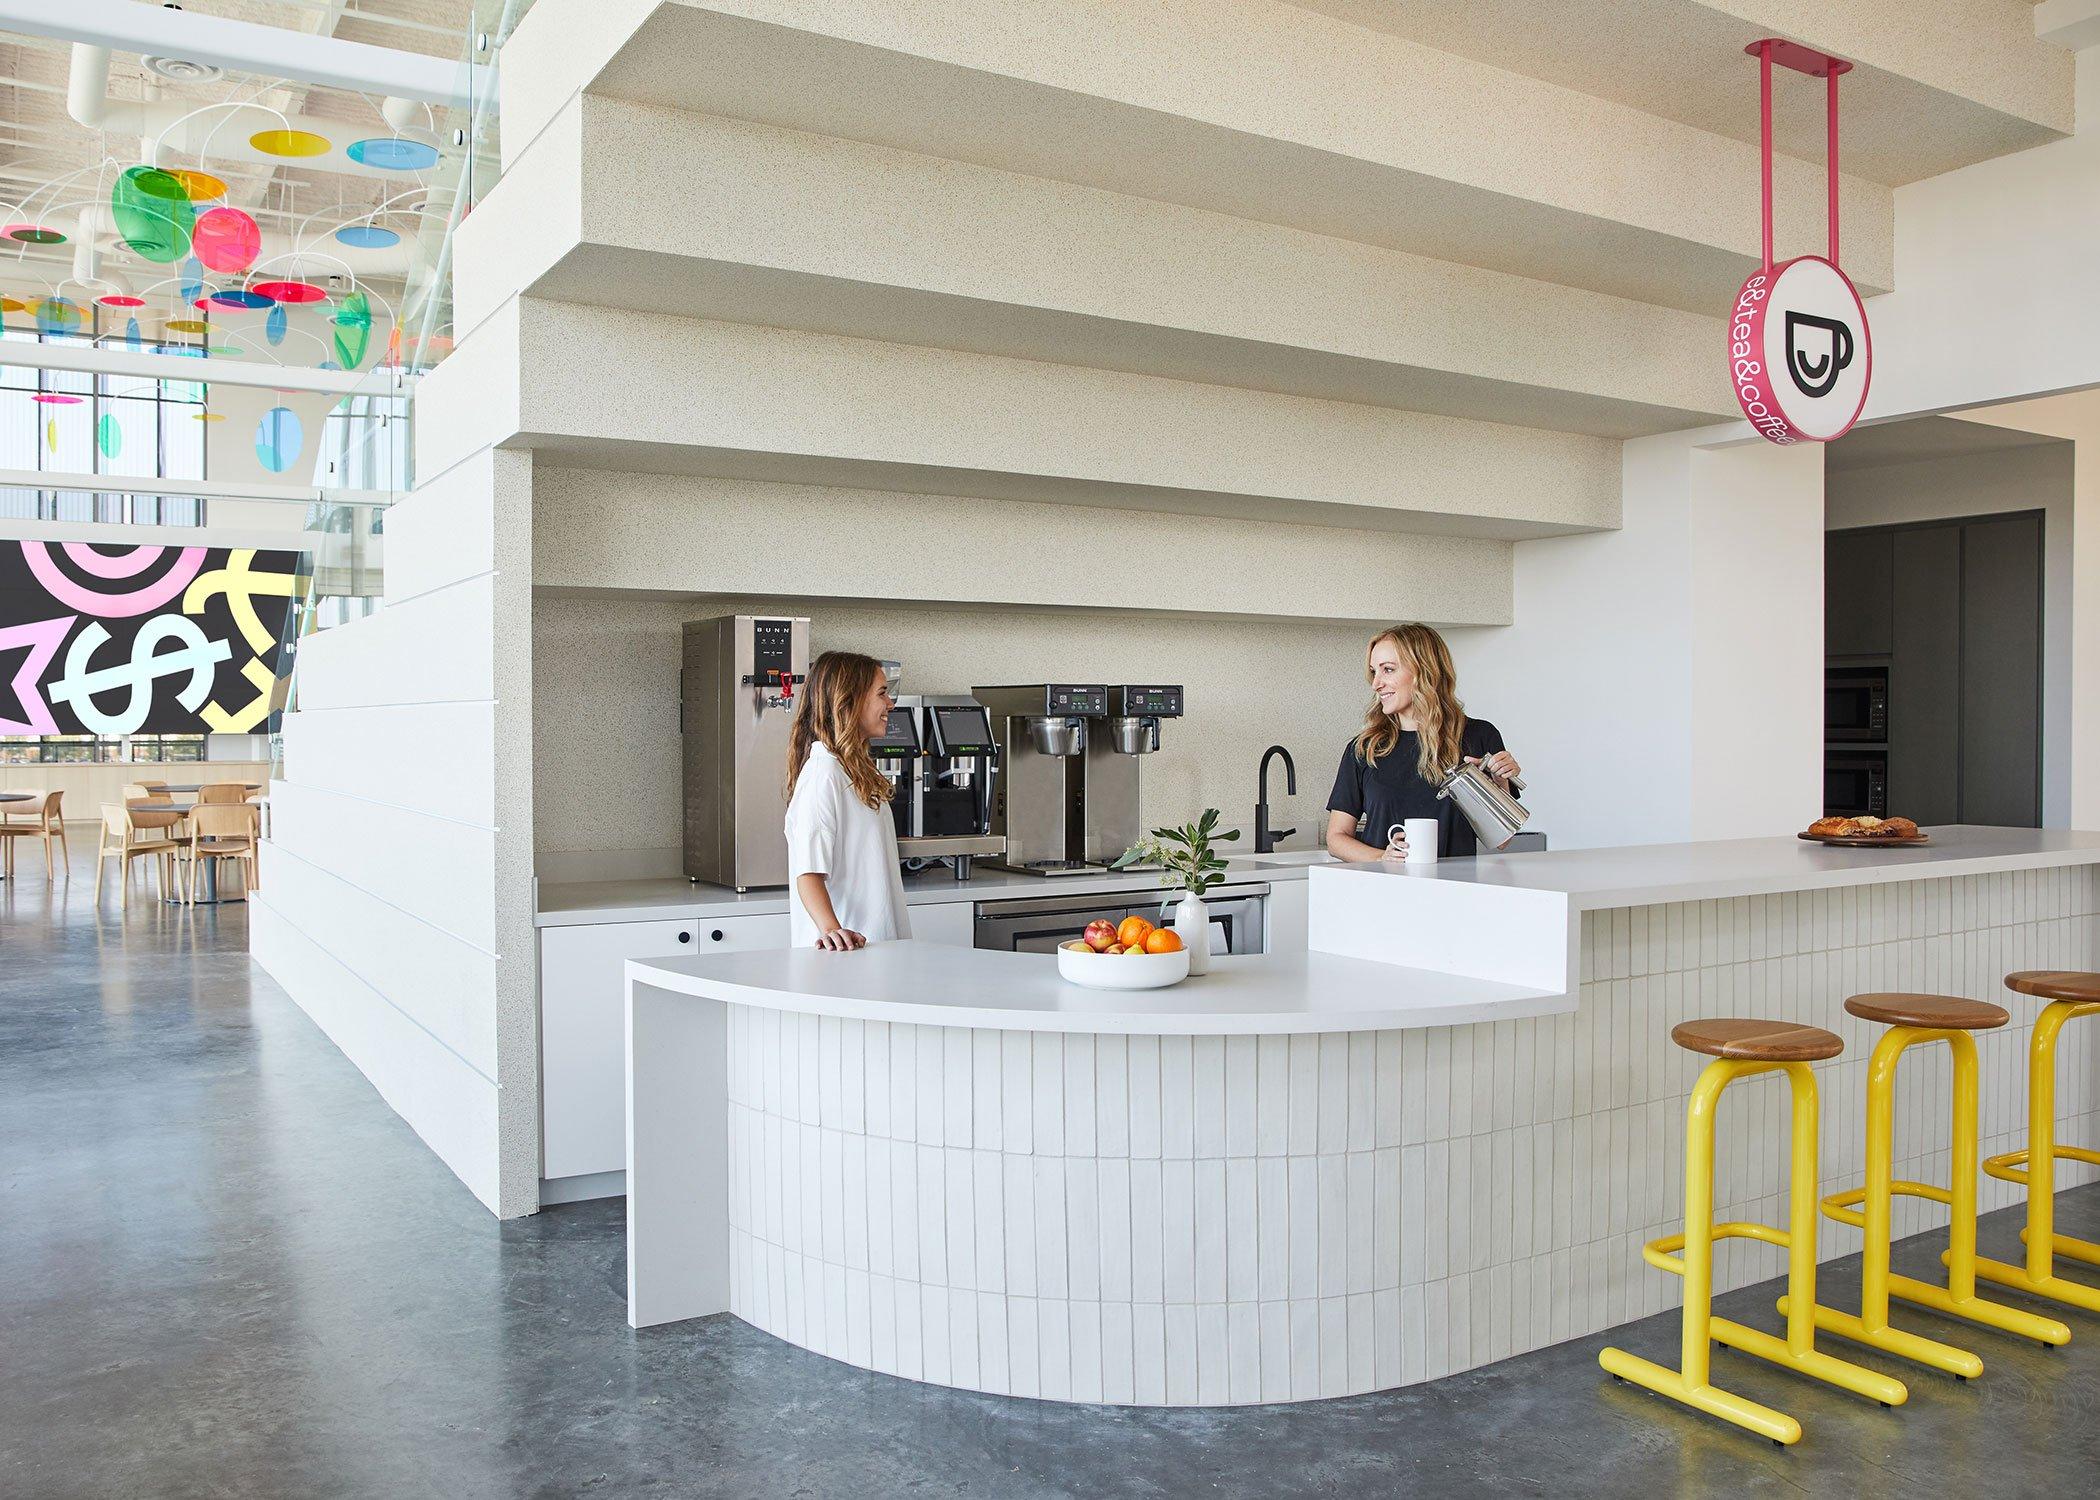 Sir-Burly-Barstool-in-Happy-Money-office-interior-design-insp